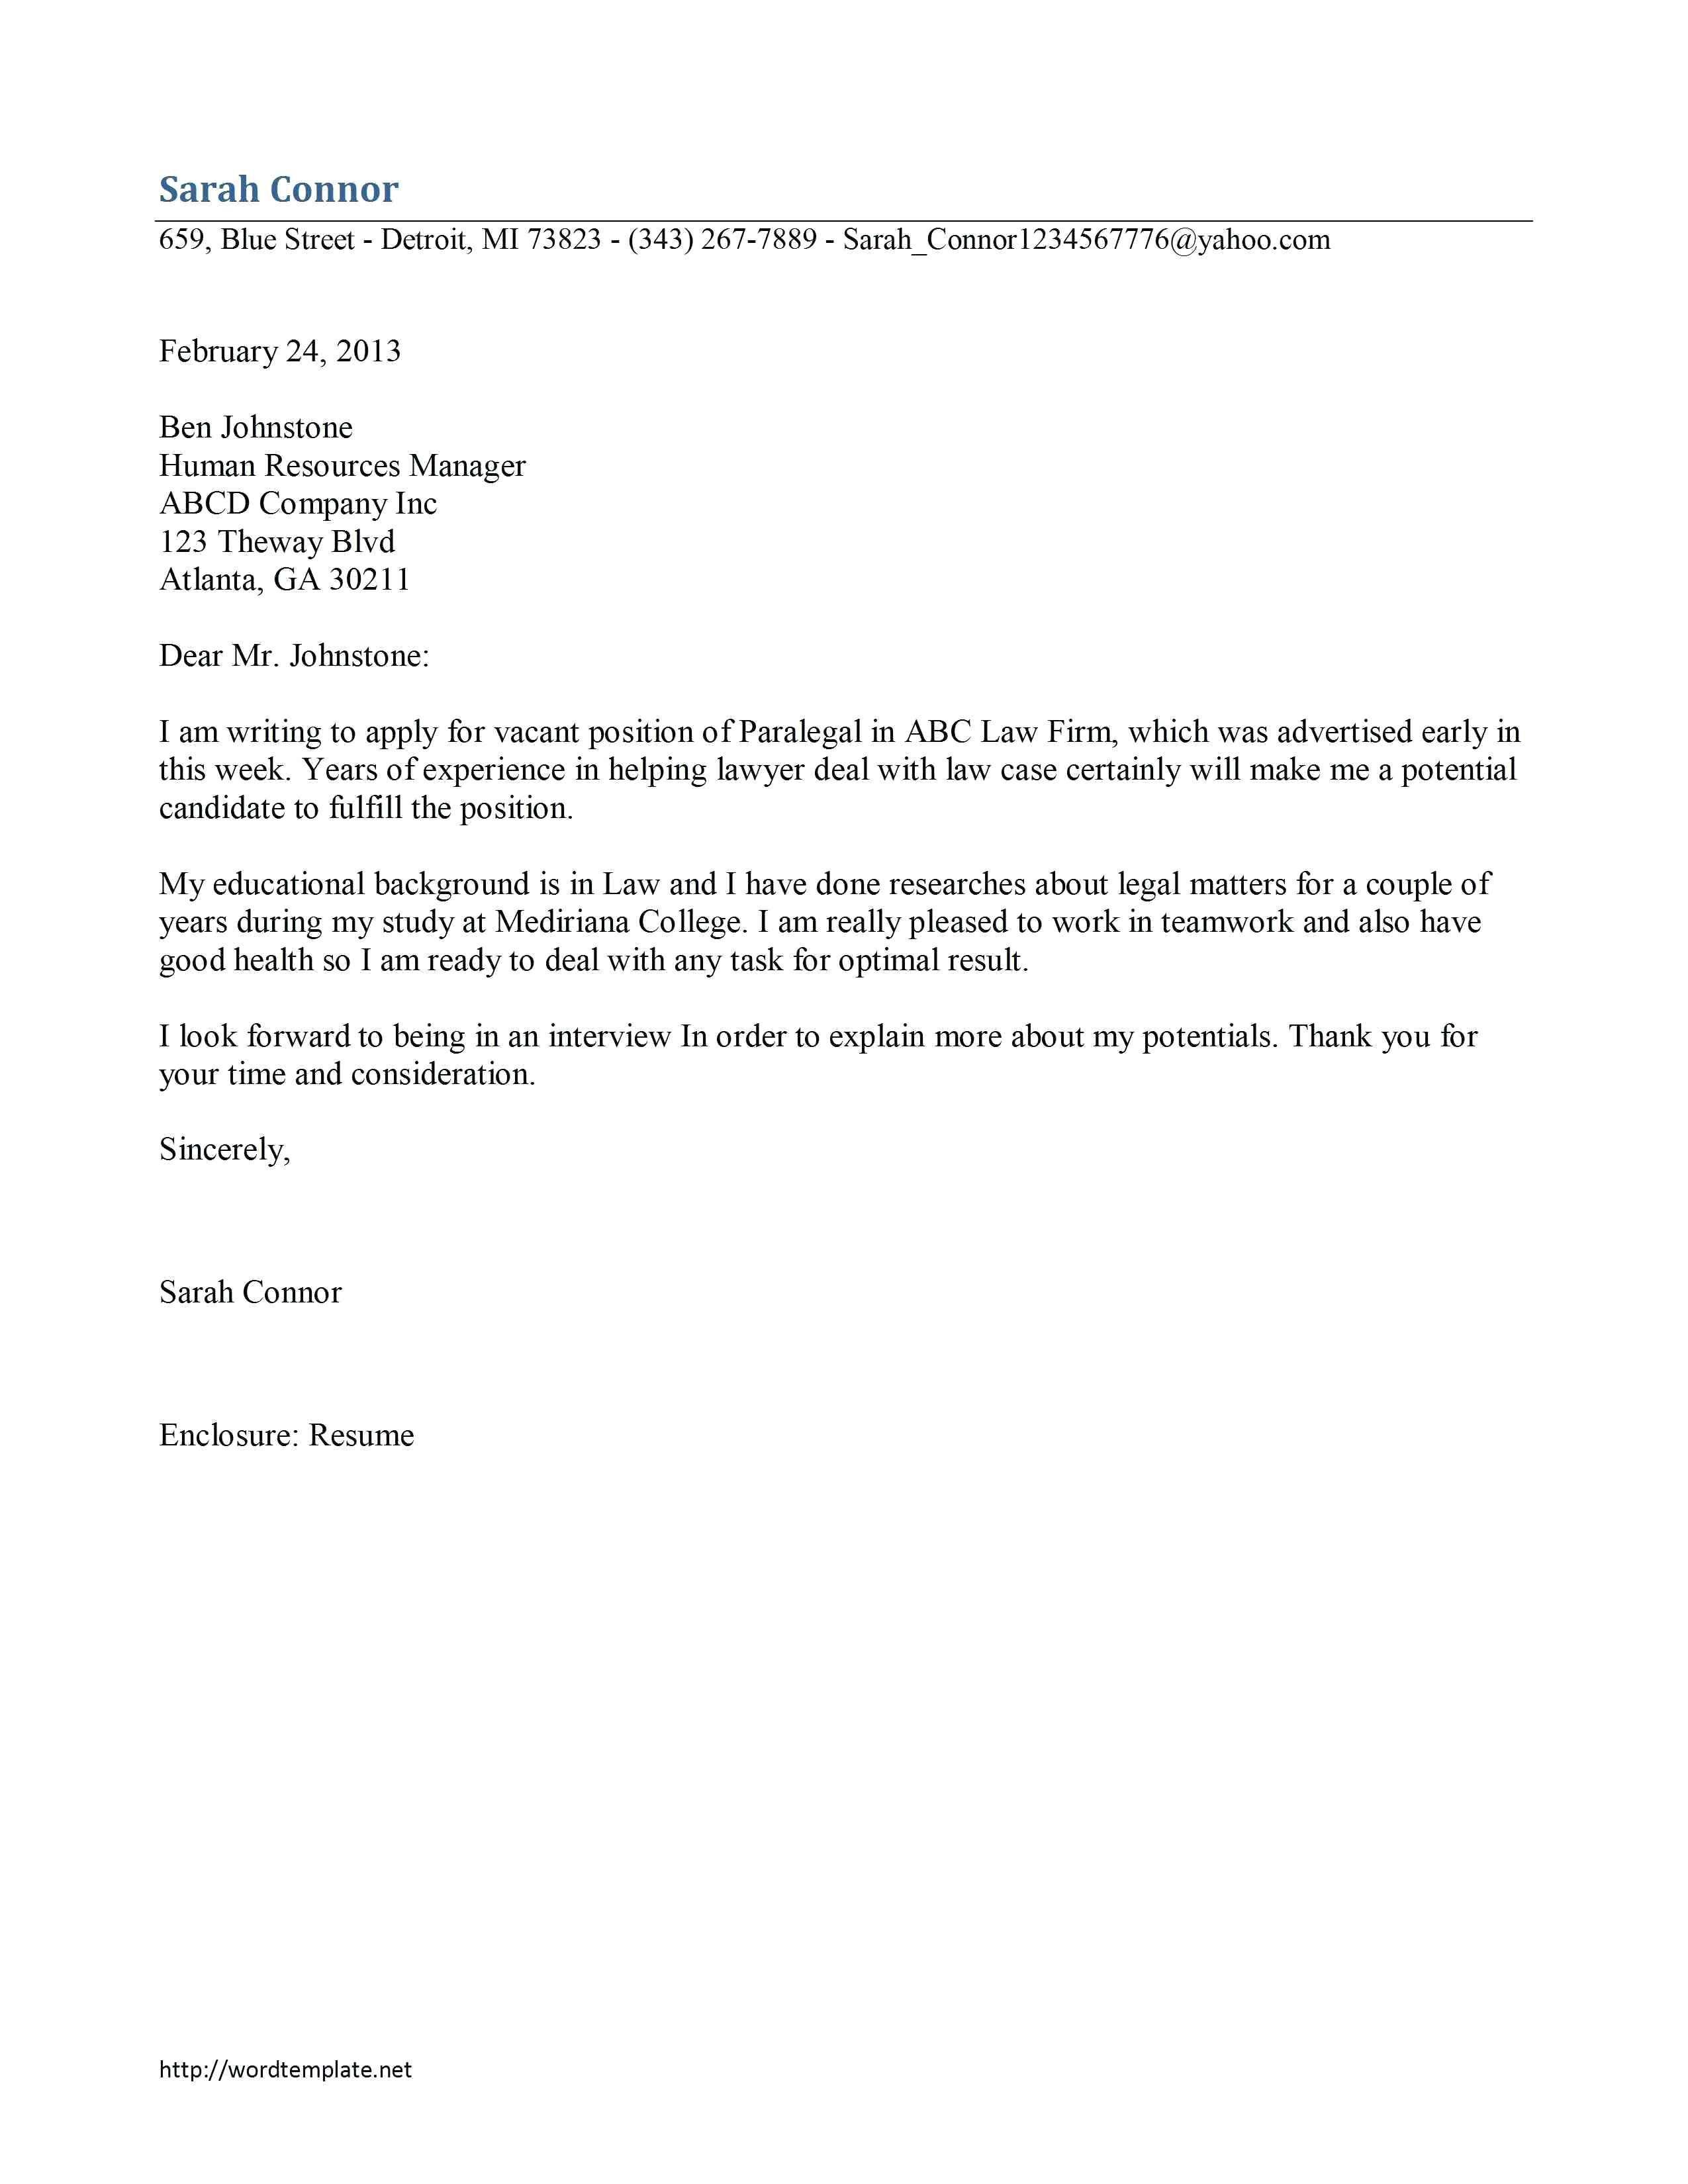 26 legal assistant cover letter cover letter for resume